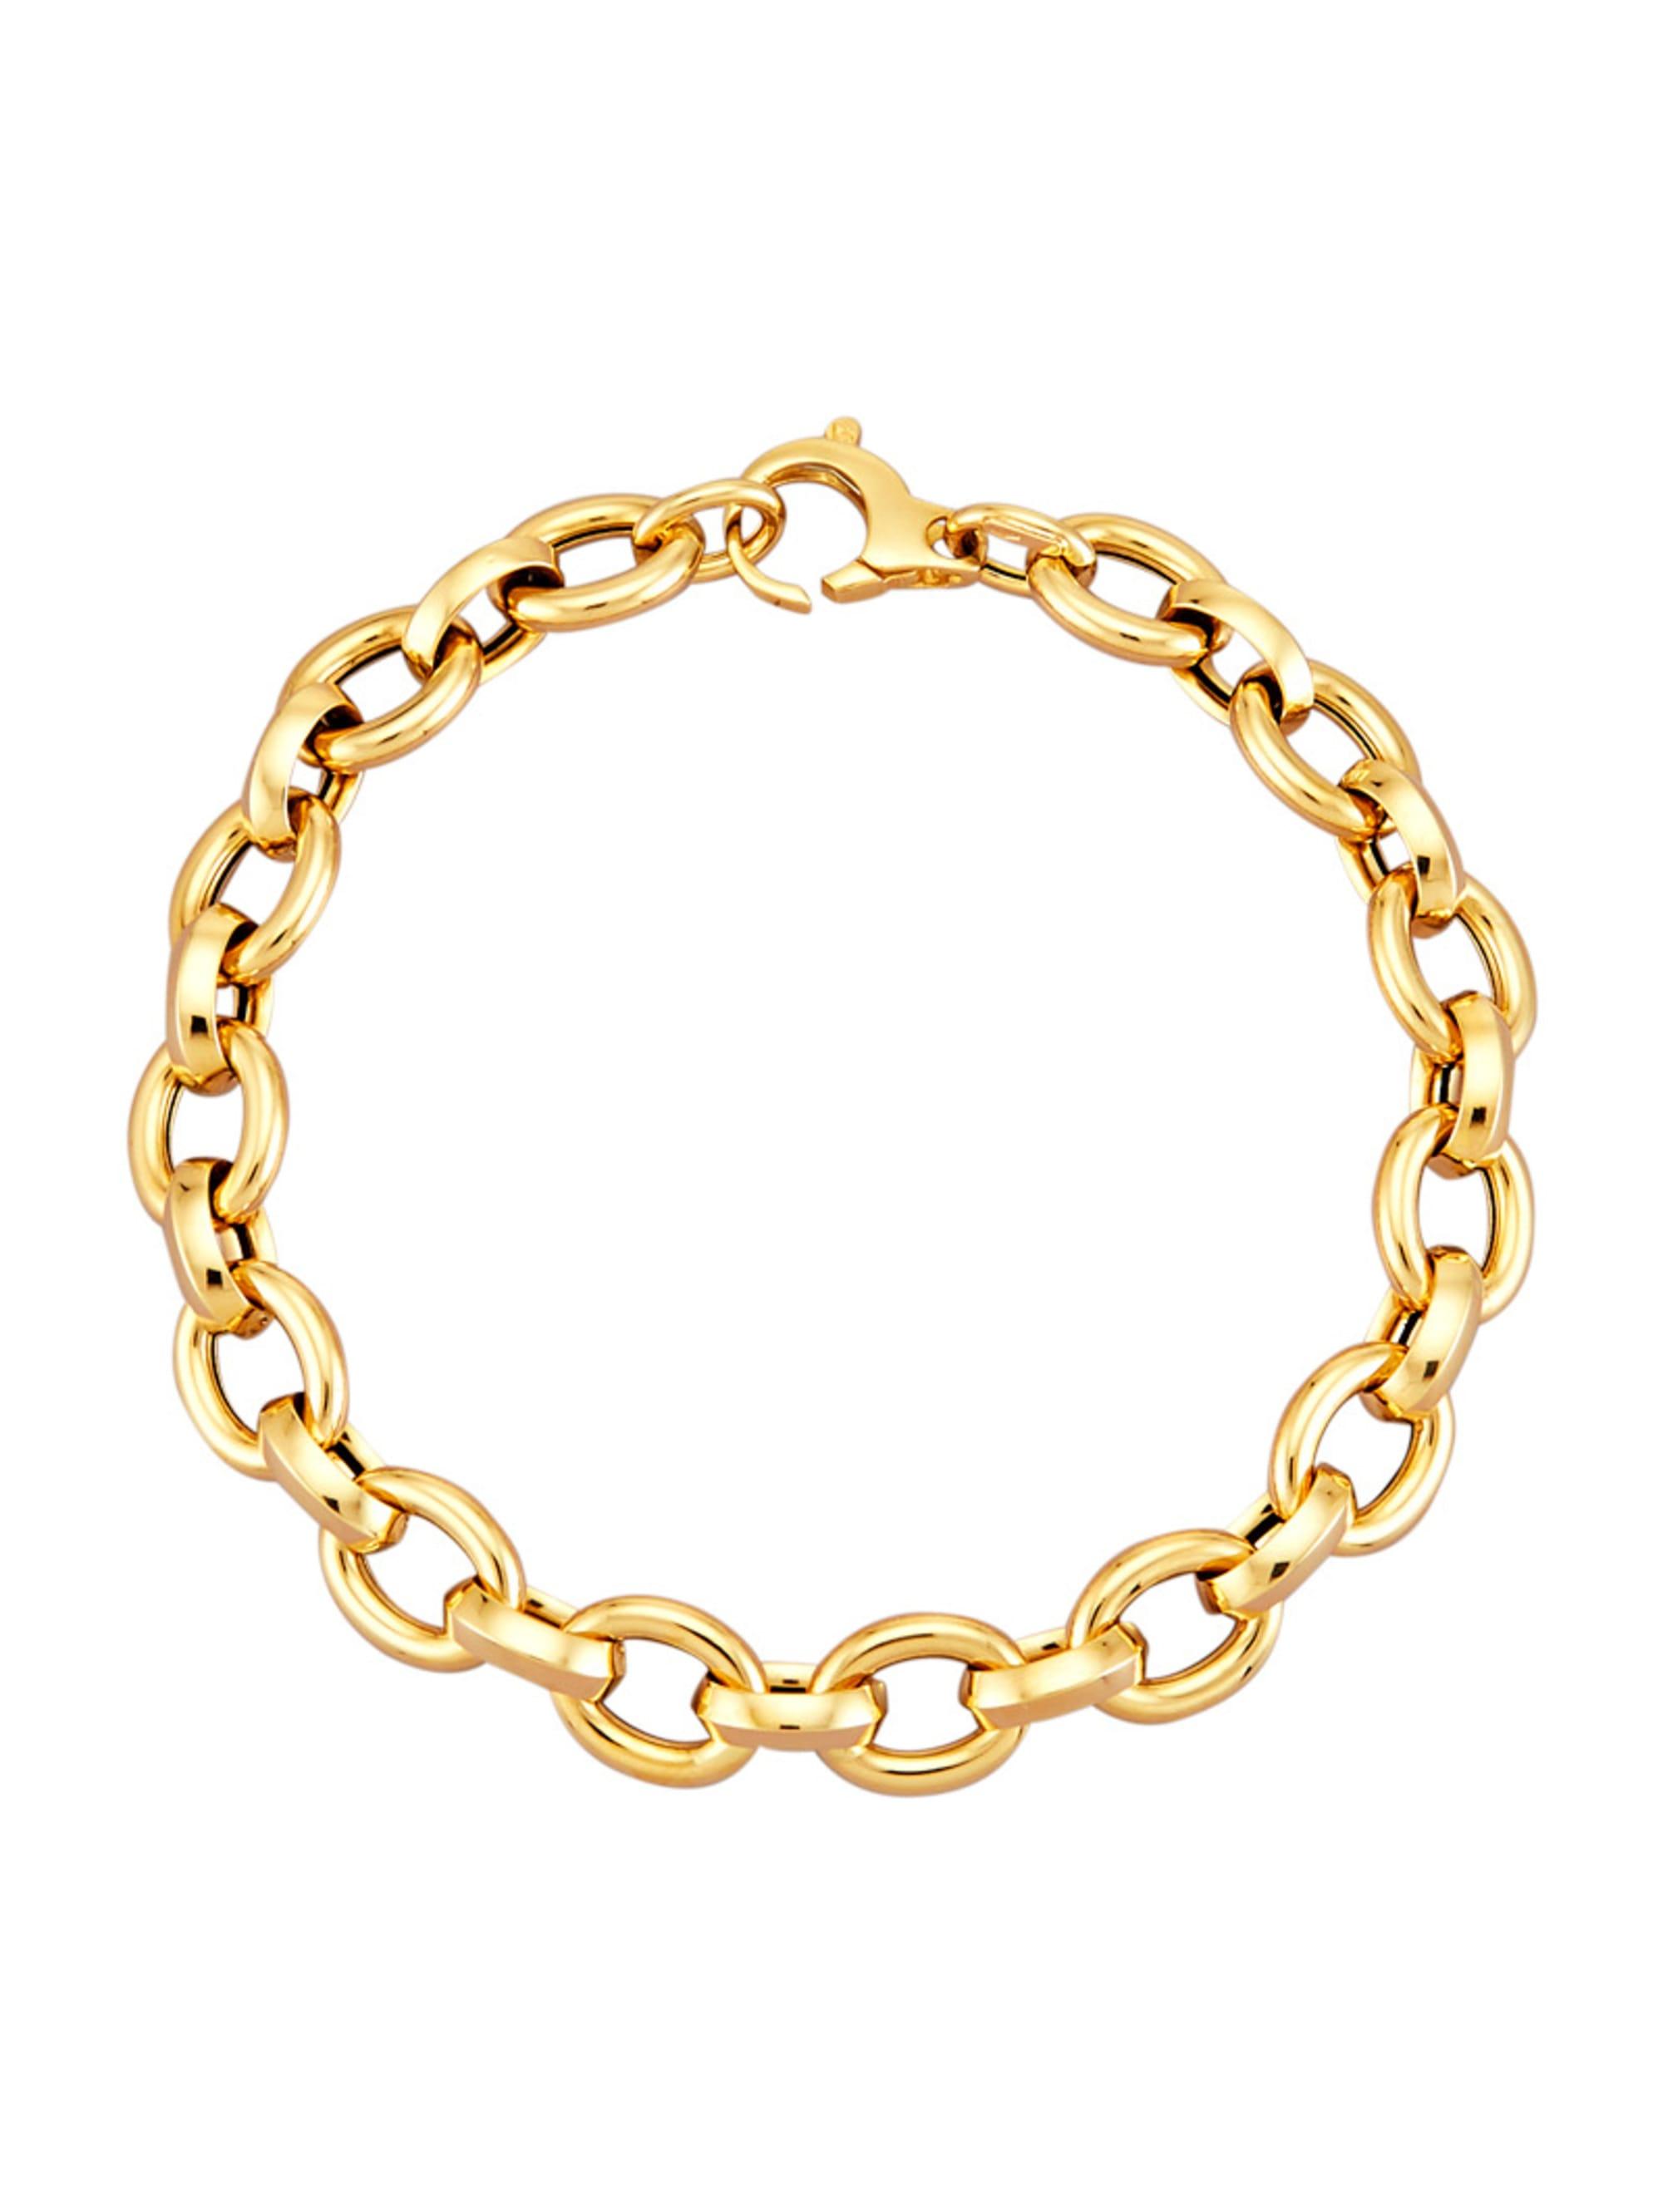 Diemer Gold Ankerarmband in Gelbgold 585 uxaPp